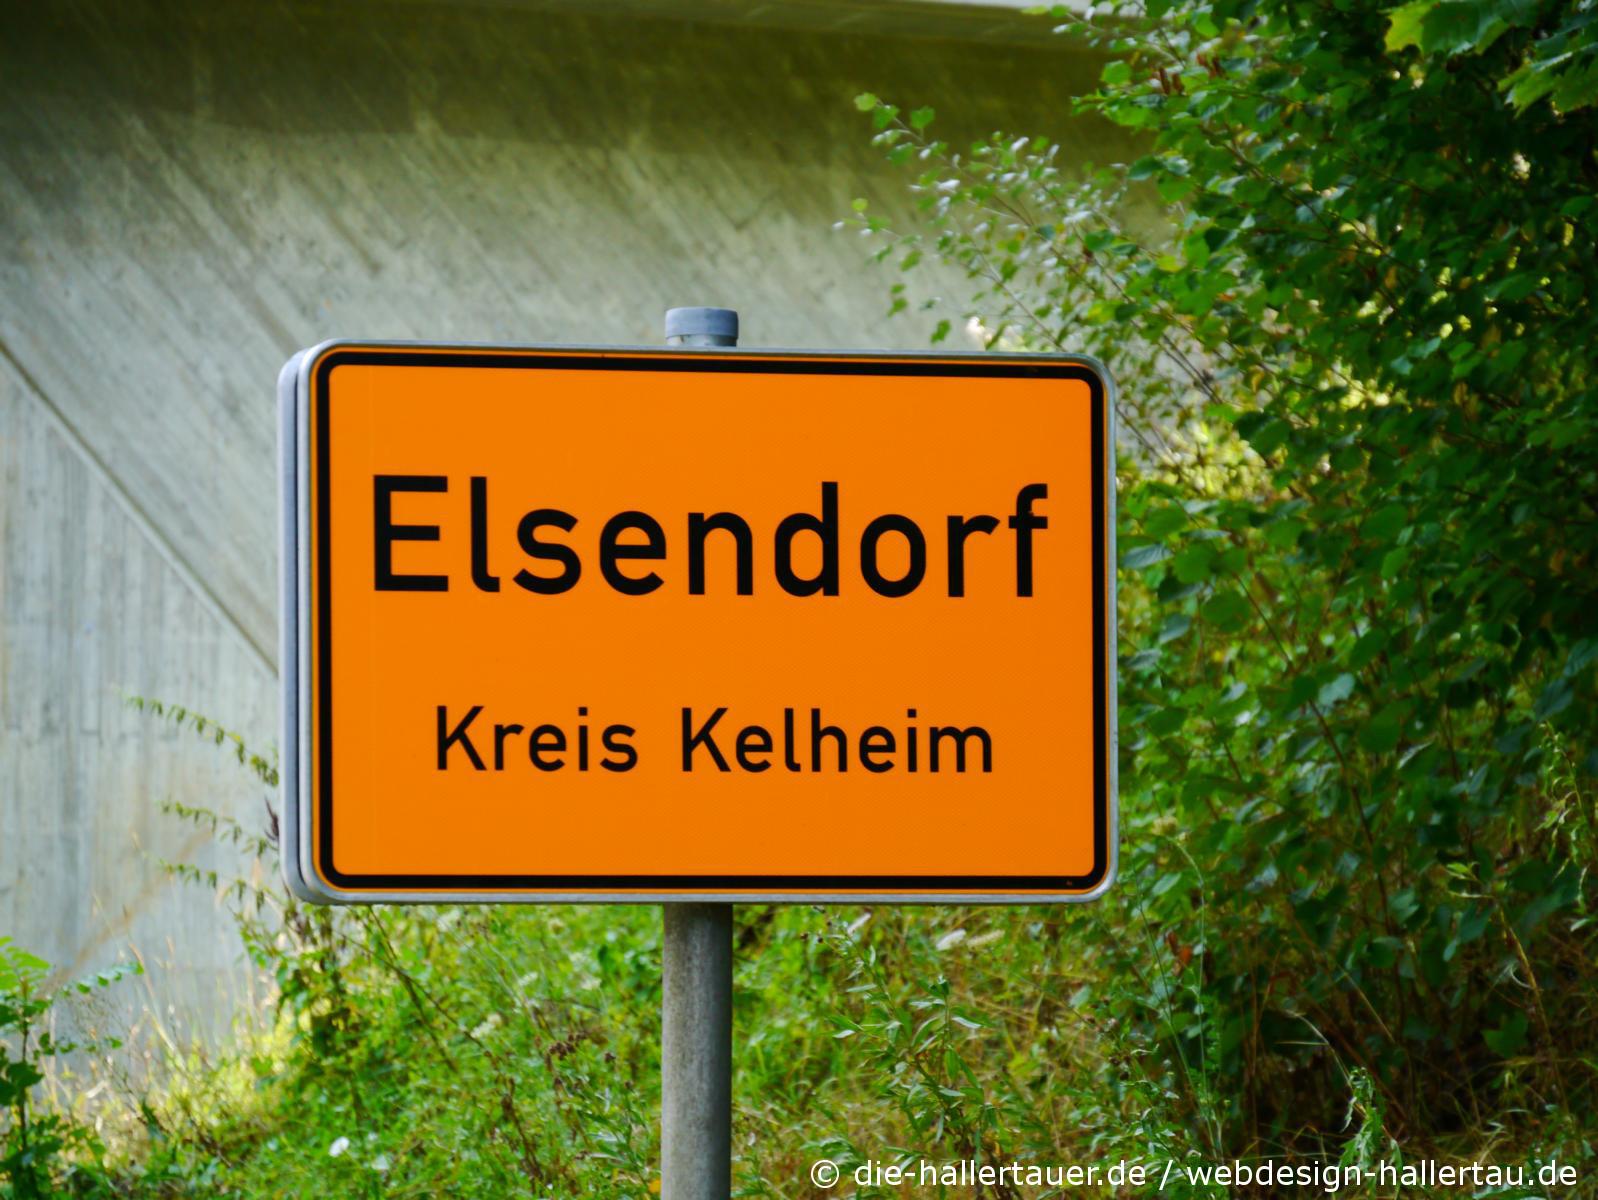 Elsendorf